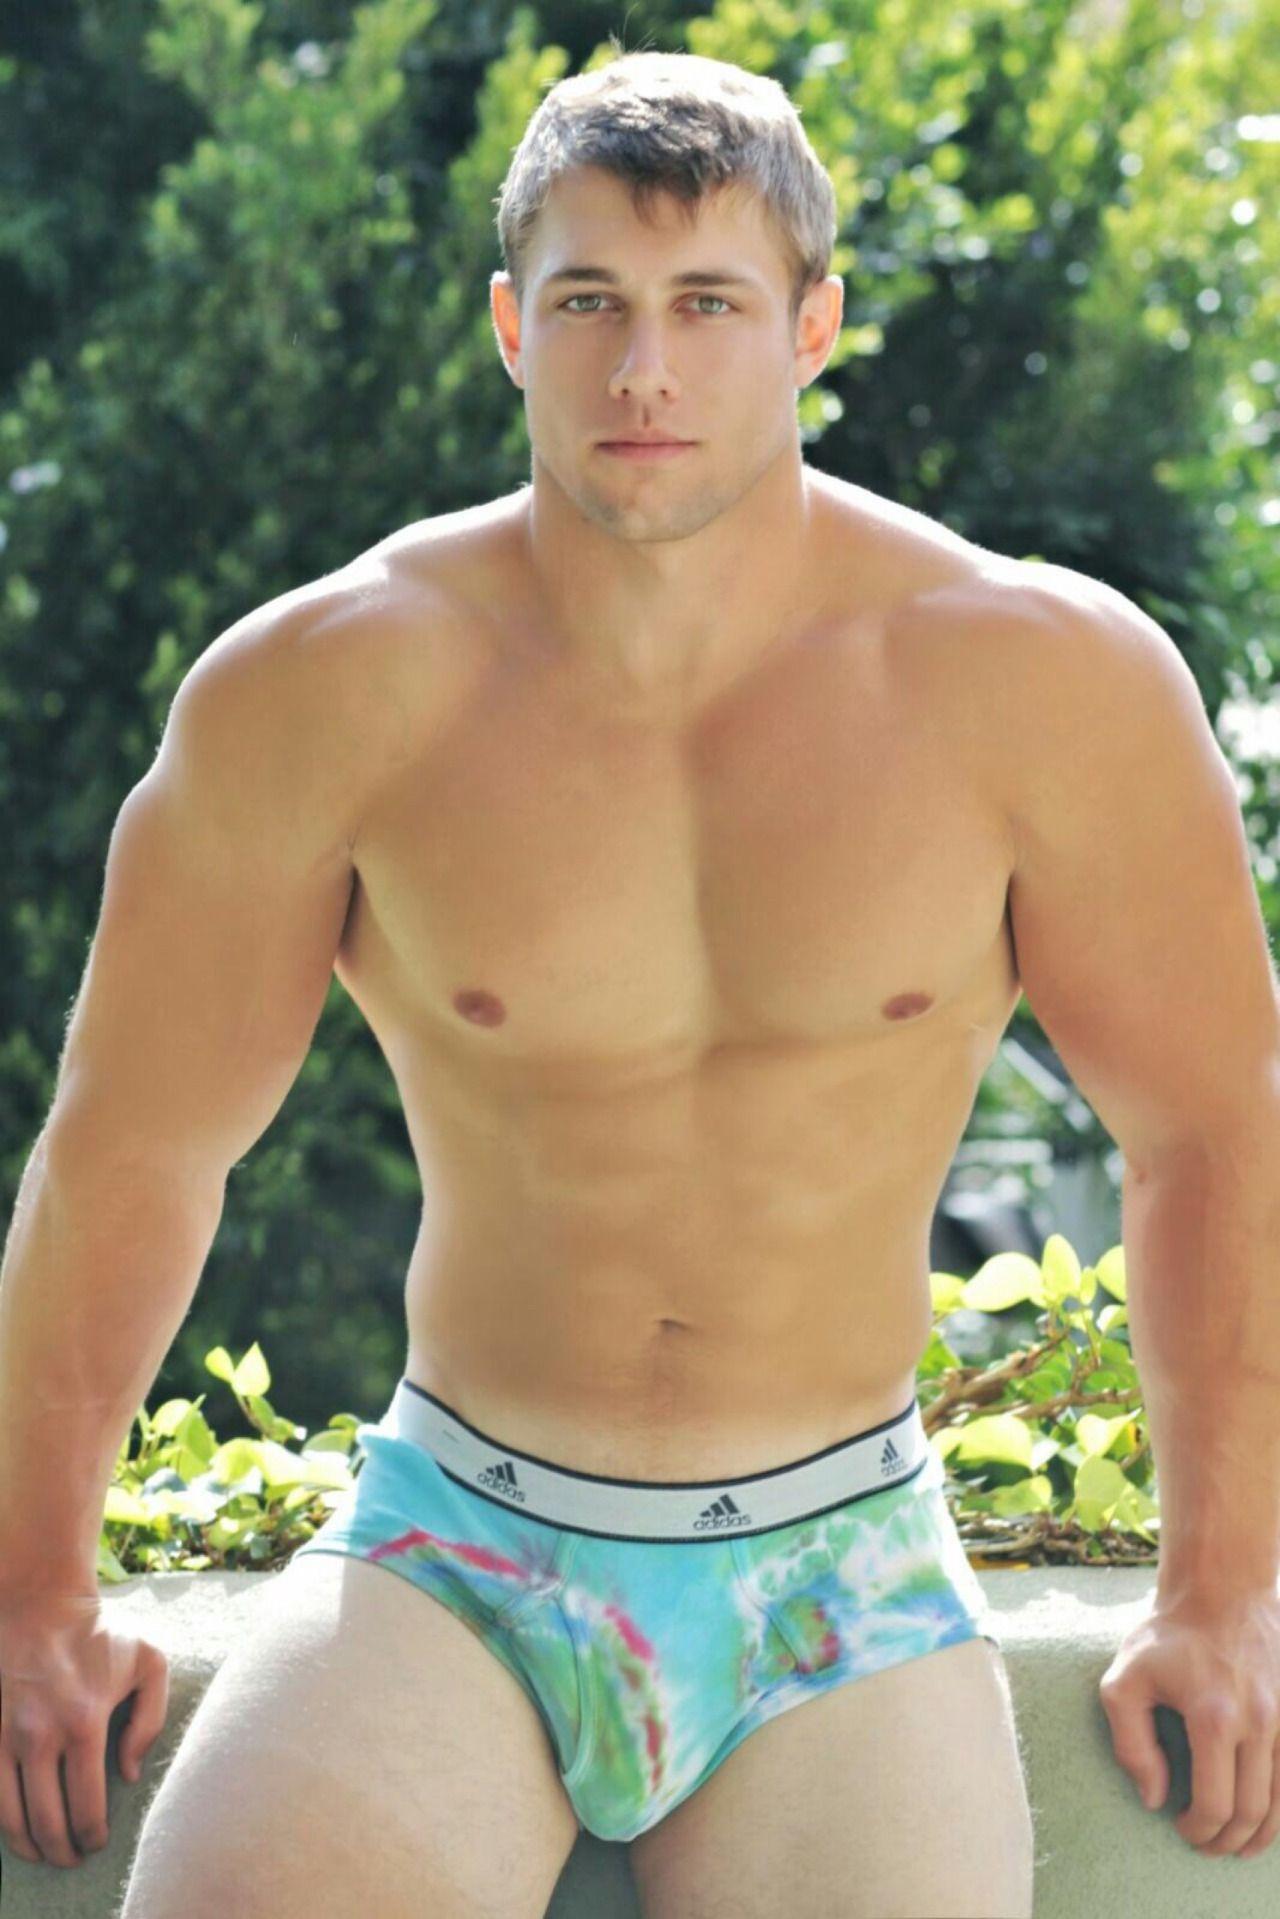 nude-gay-men-underwear-gallery-tanned